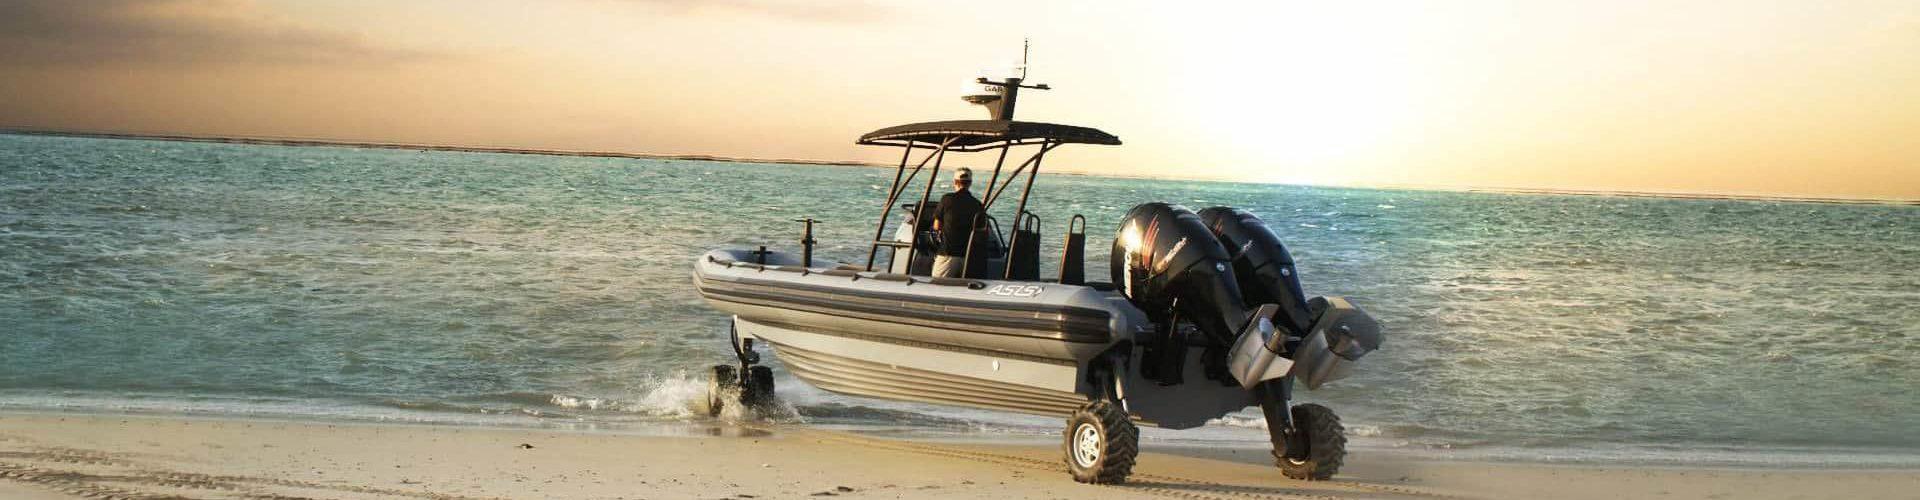 Rigid-Inflatable-Boat-Amphibious-1-1920x500